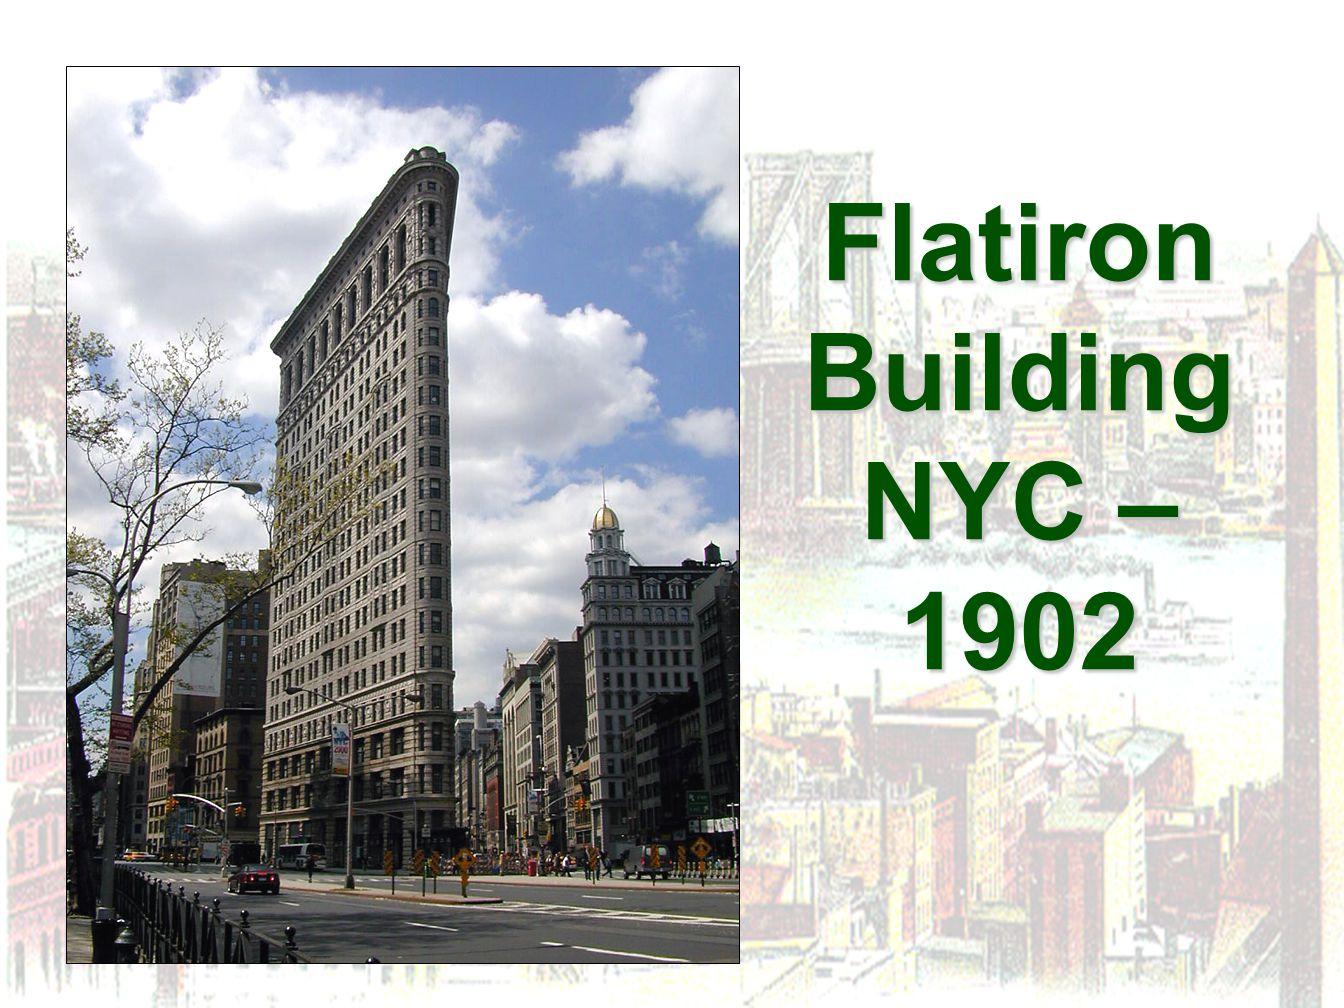 Flatiron Building NYC – 1902